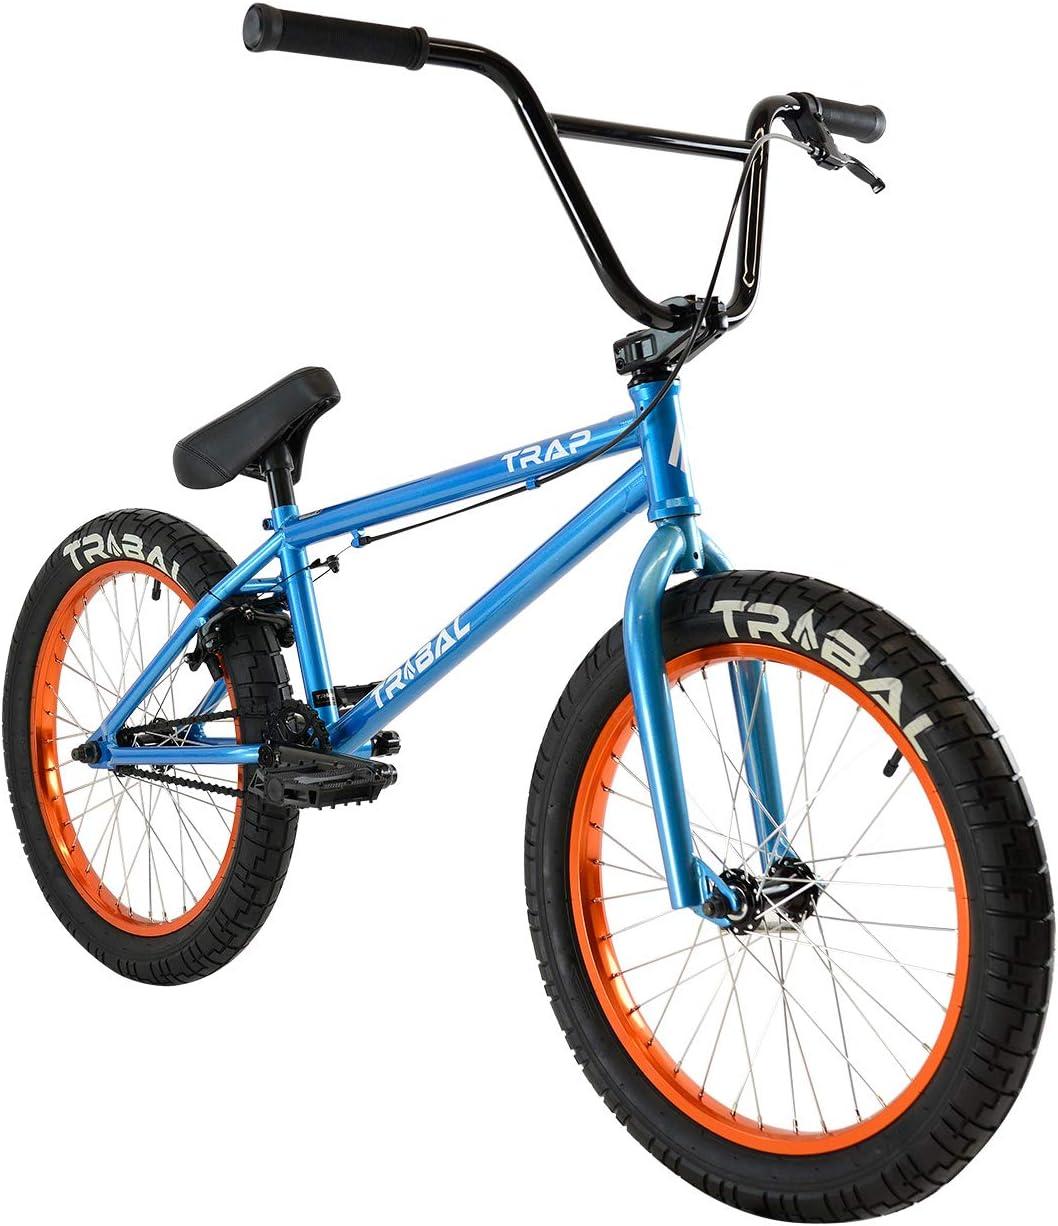 Trampa Tribal BMX - Bicicleta BMX, color azul cielo metálico, Met ...